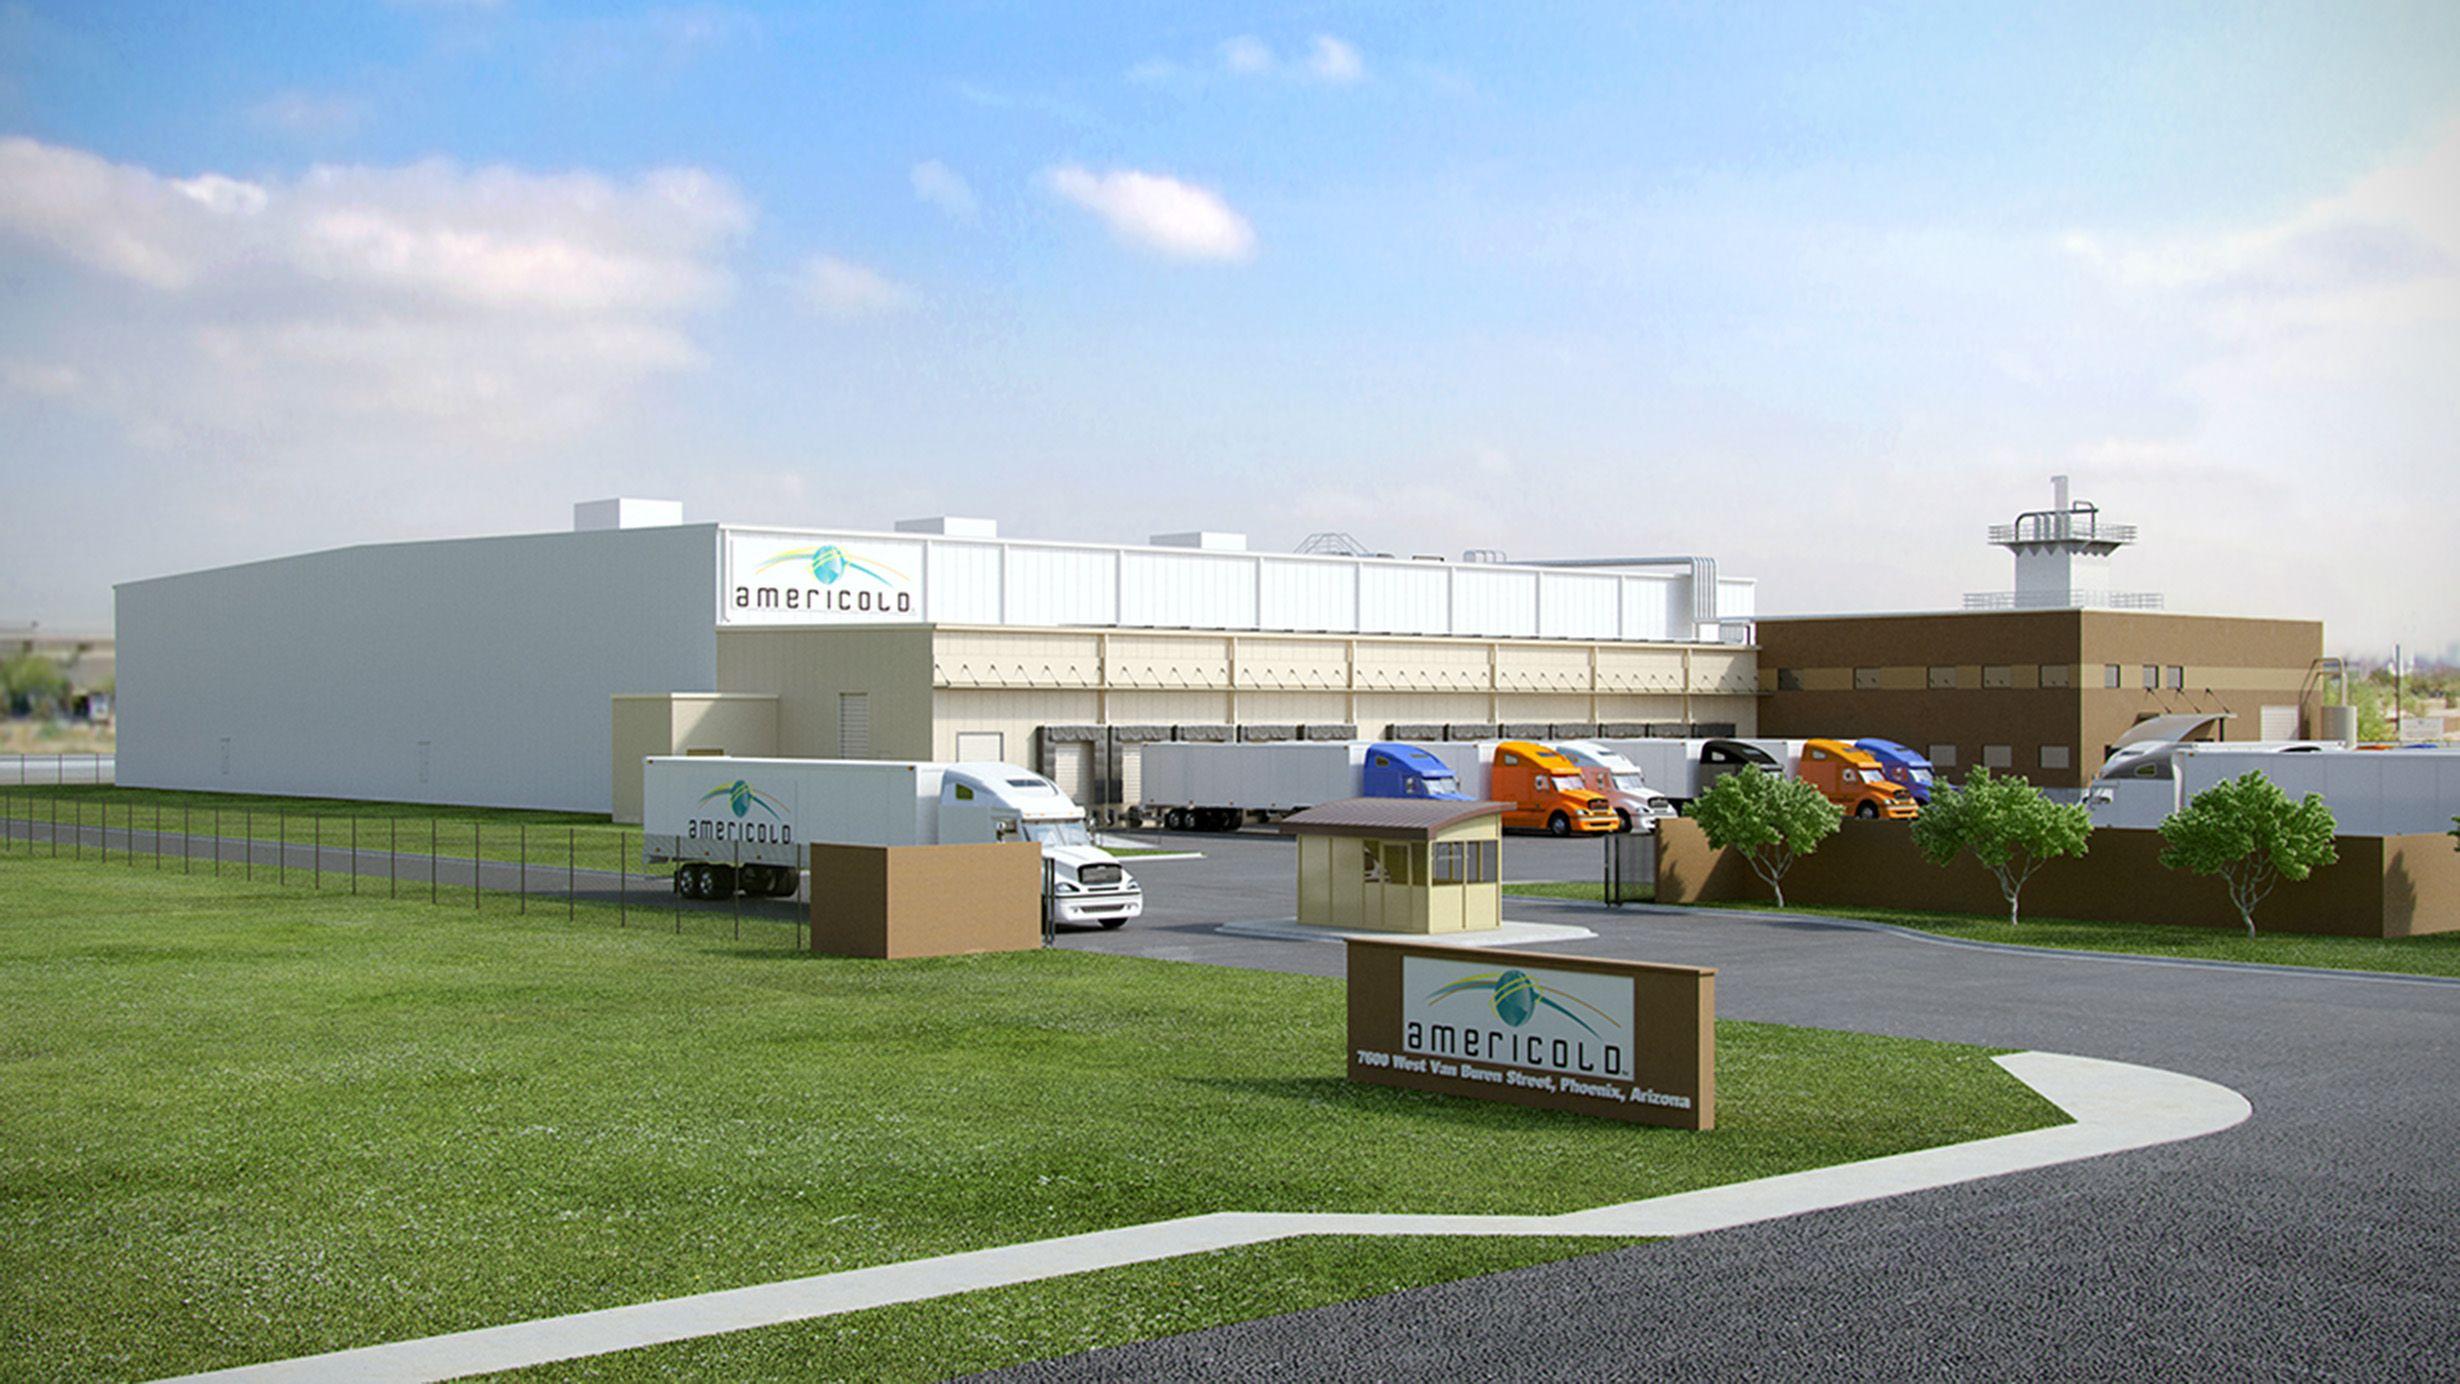 Americold Warehouses Innovative Logistics Solutions